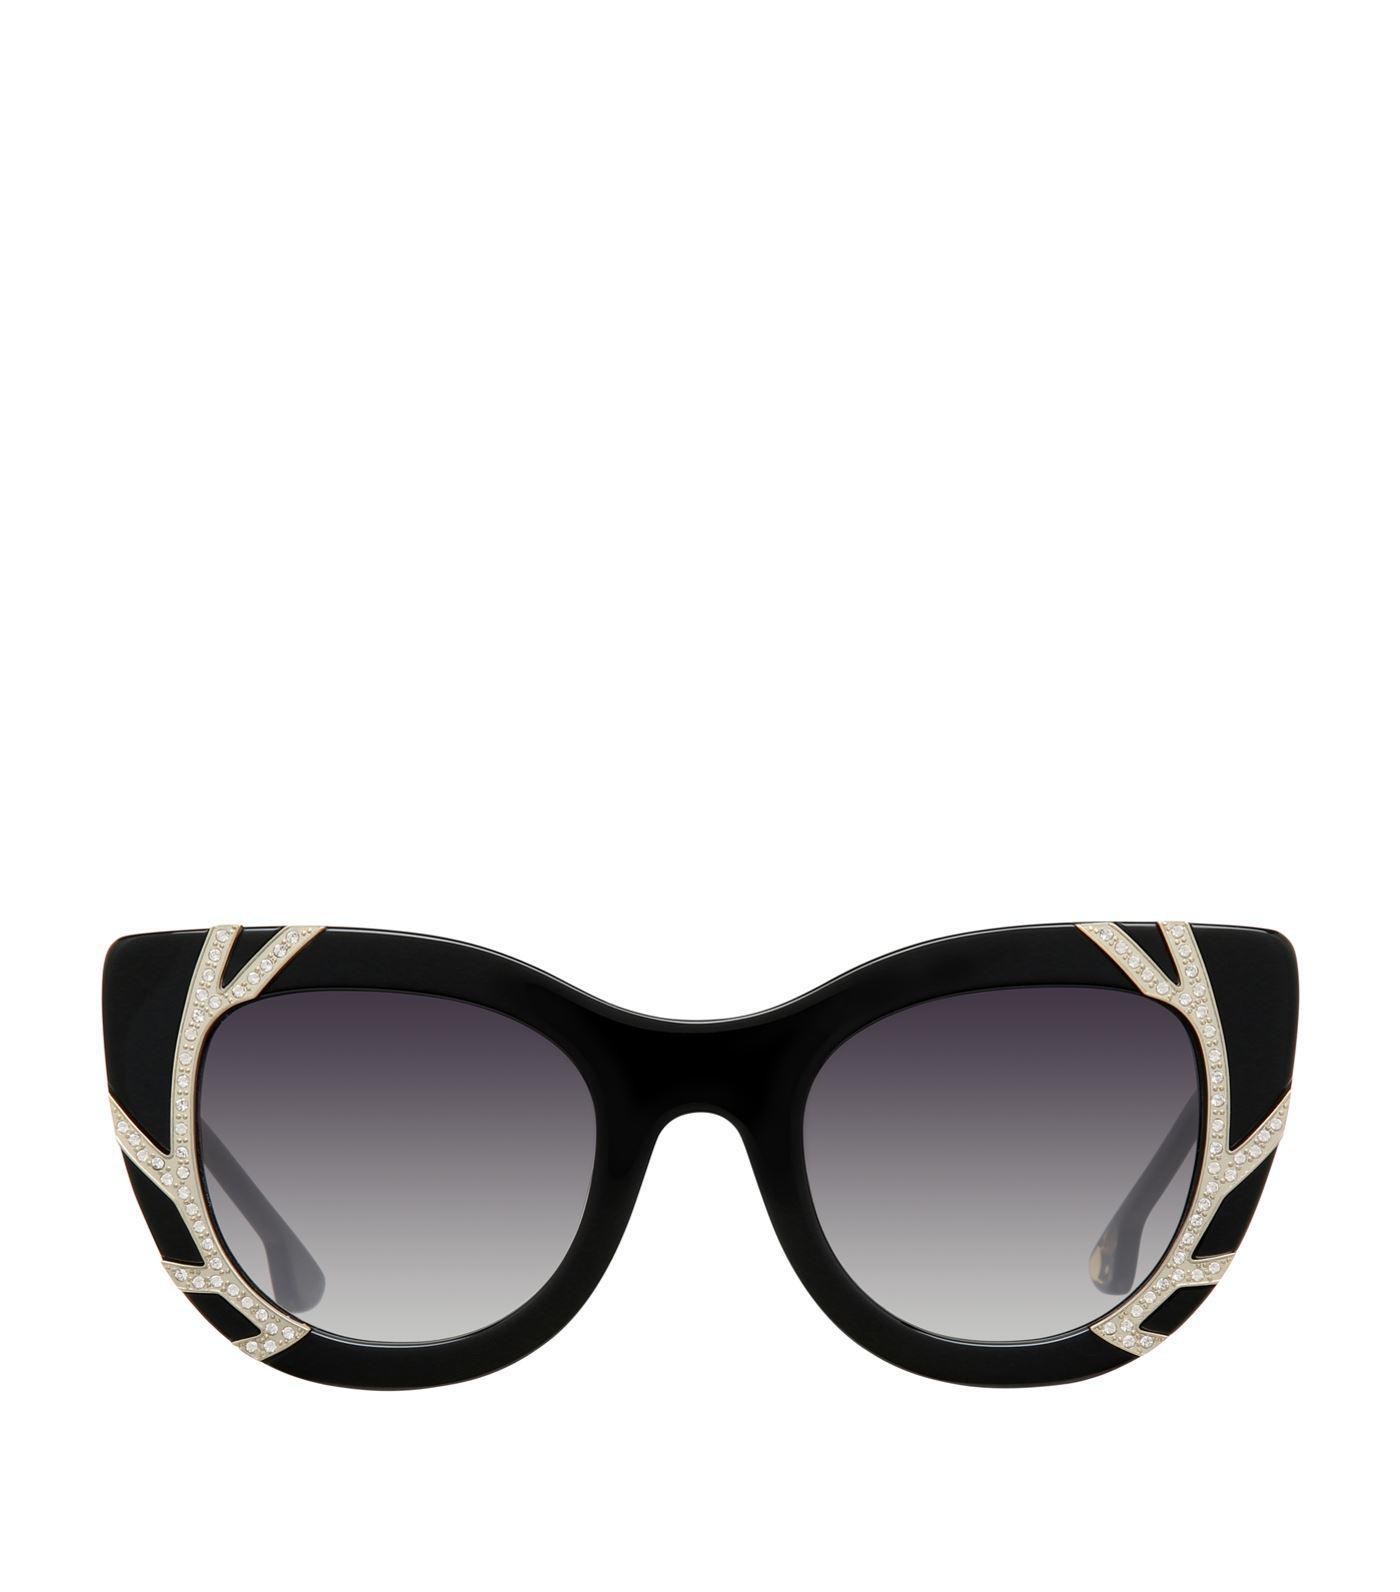 20f25c0de1 Alice + Olivia Delancey Cat Eye Sunglasses in Black - Lyst